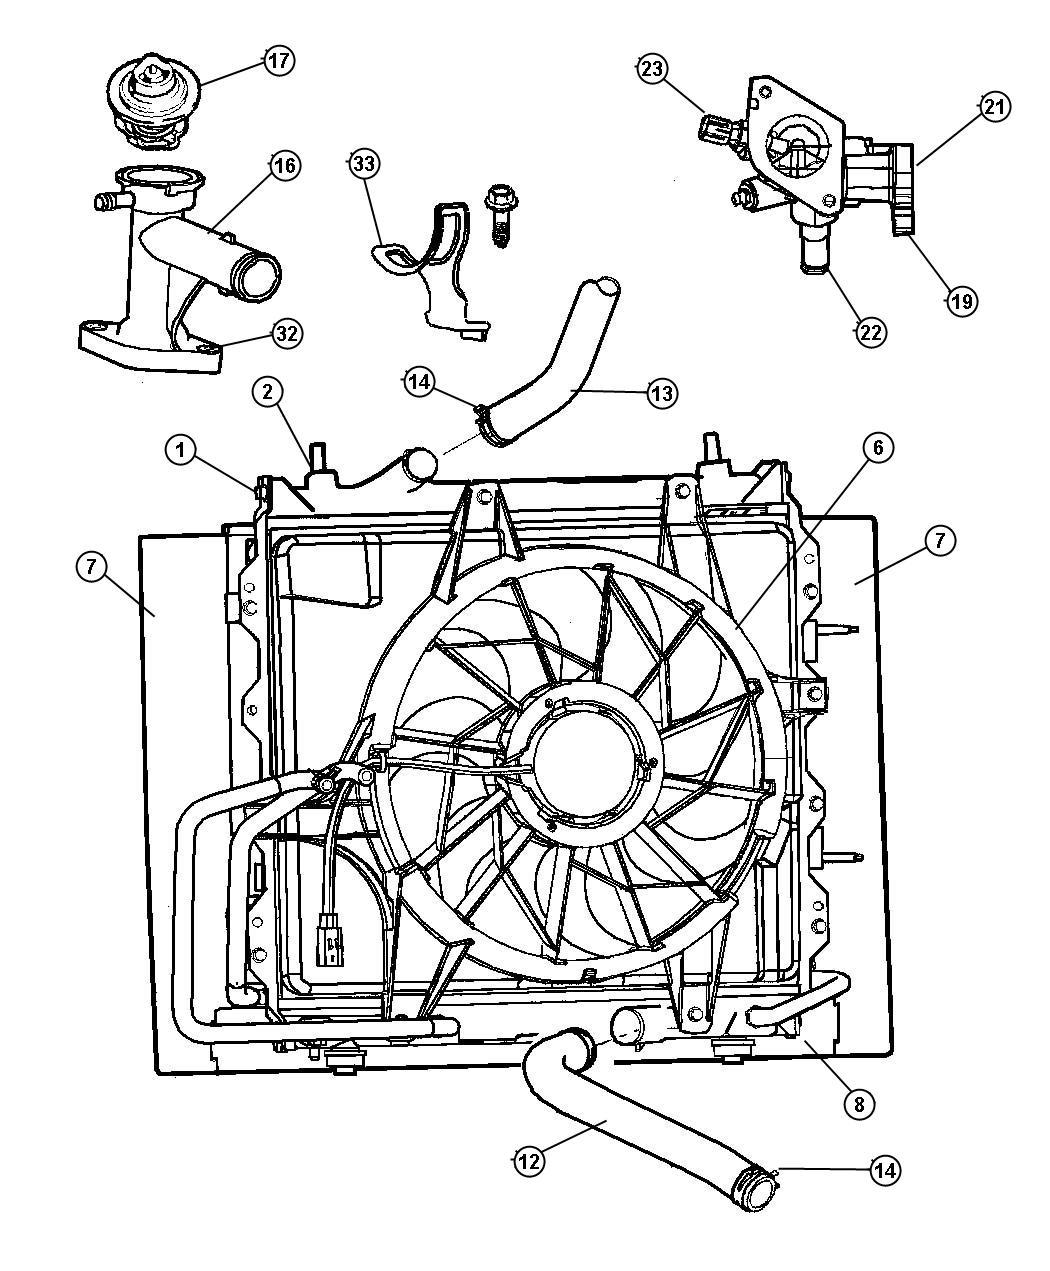 Chrysler Pt Cruiser Radiator Engine Cooling Air